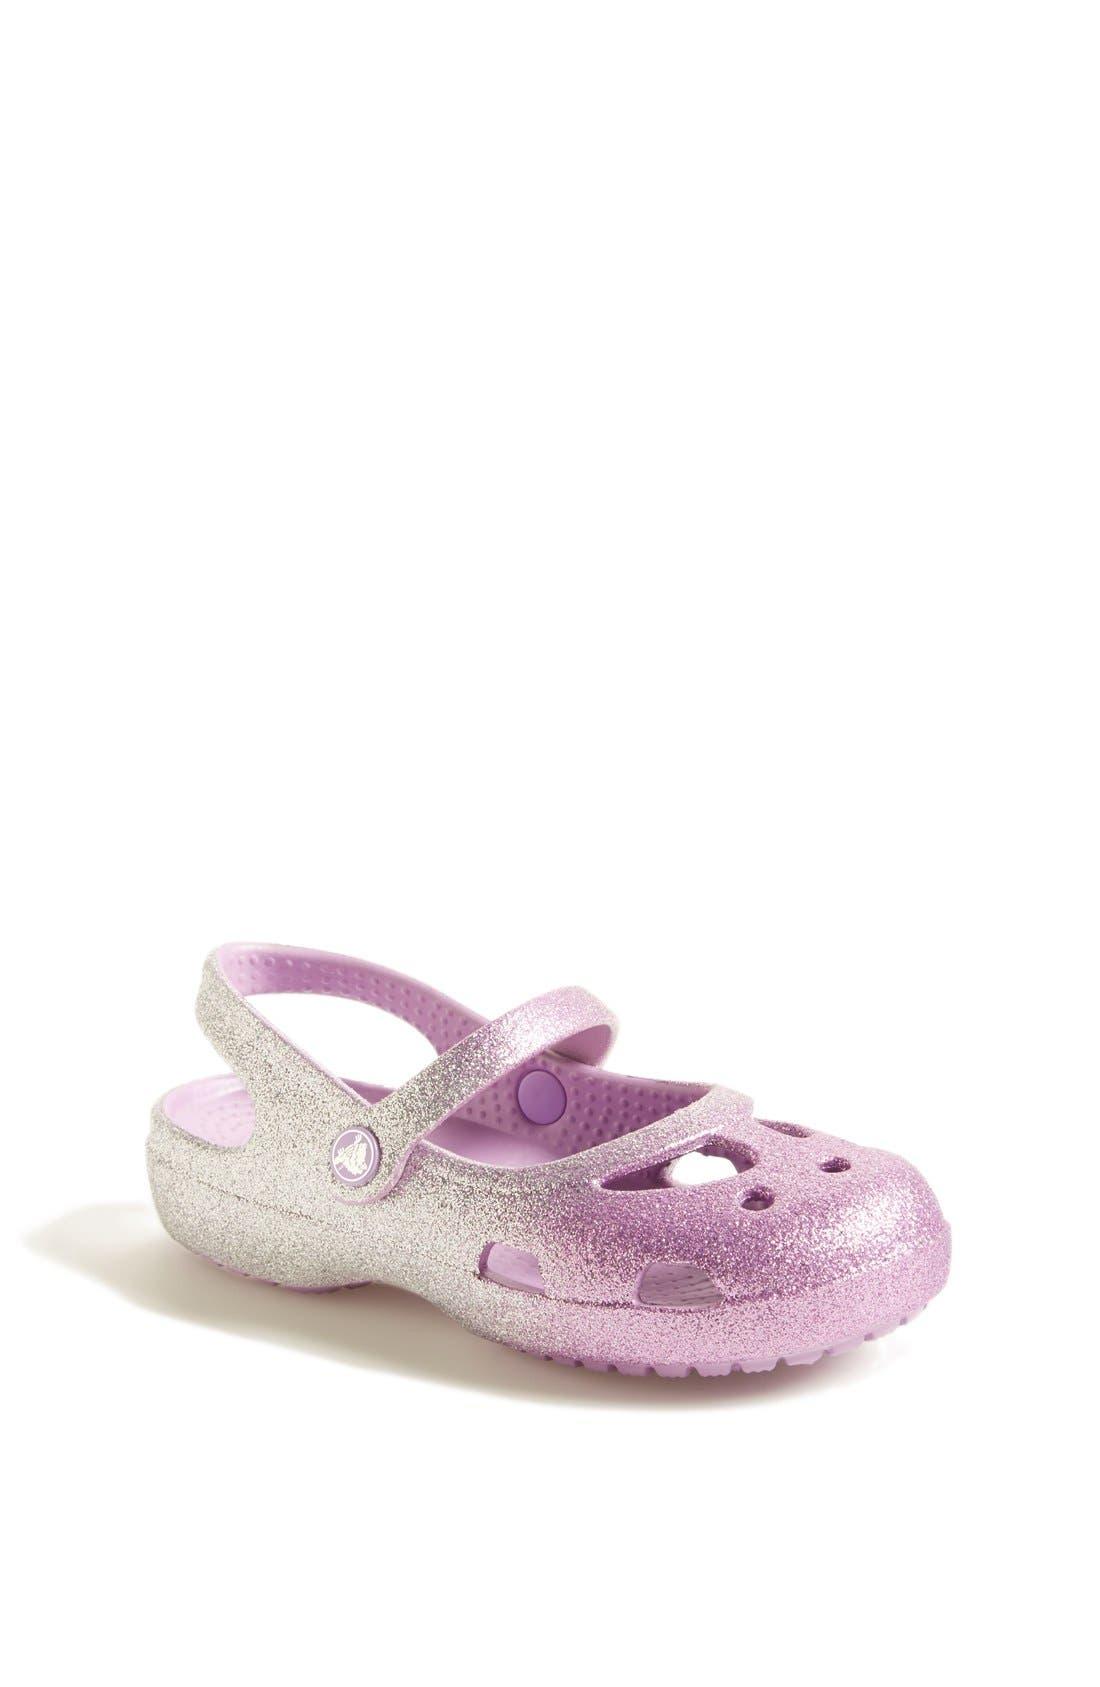 Main Image - CROCS™ 'Shayna' Sandal (Baby, Walker, Toddler & Little Kid)